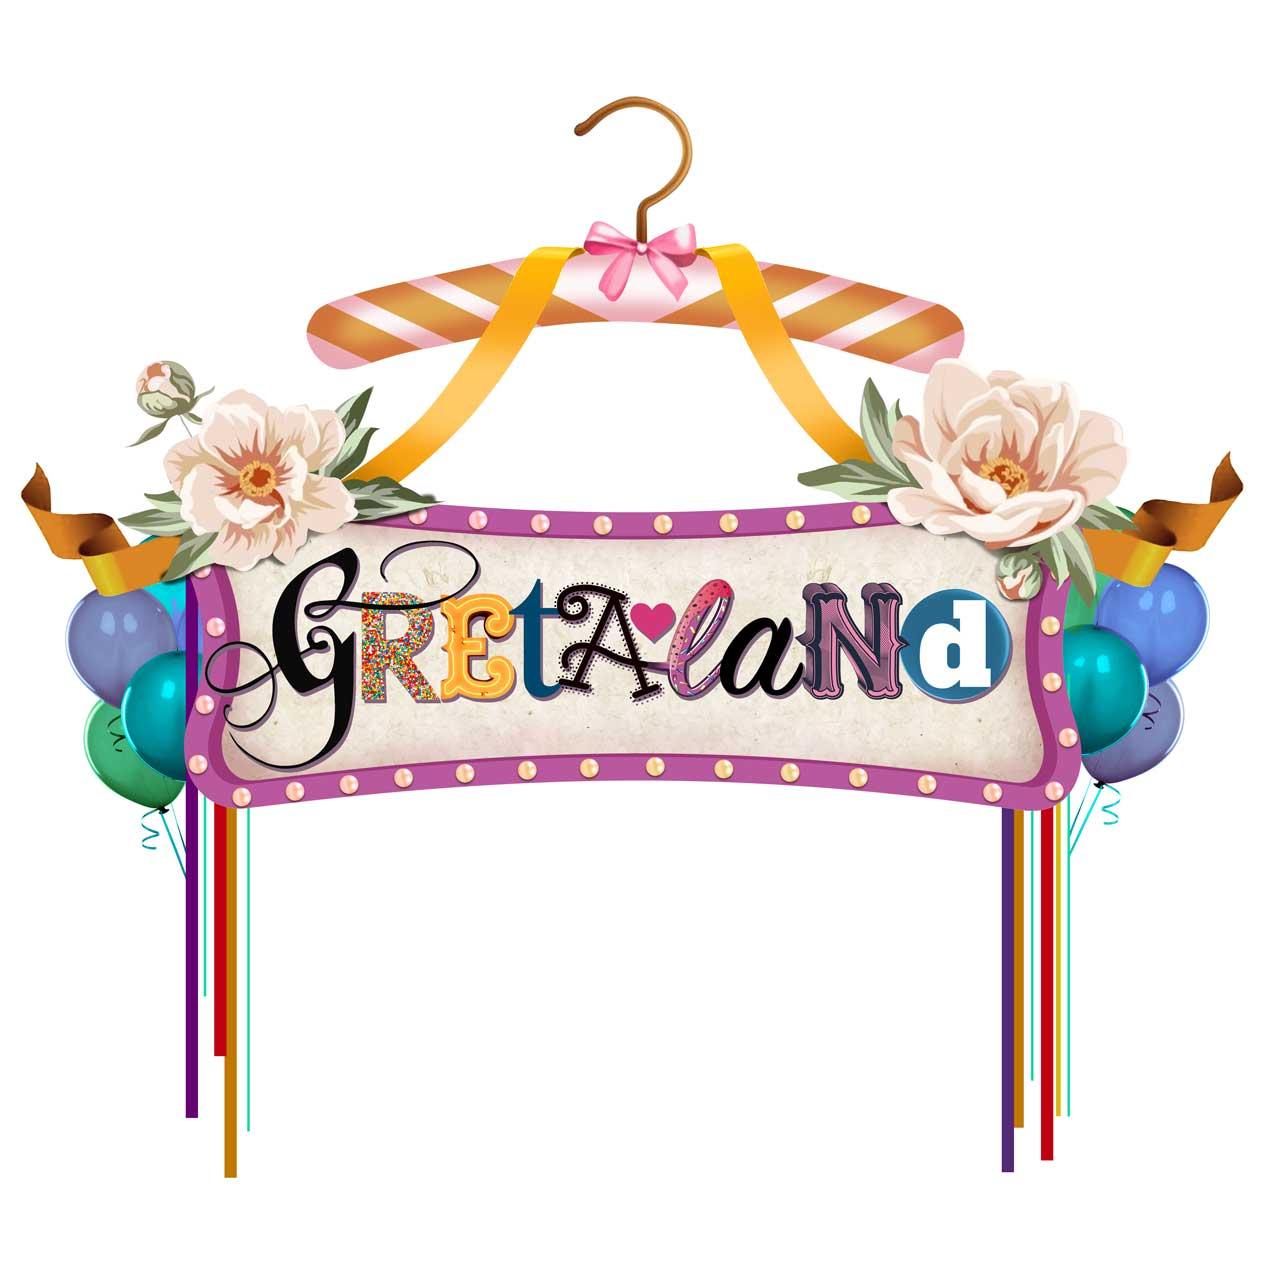 Grafik Gretaland Entrée